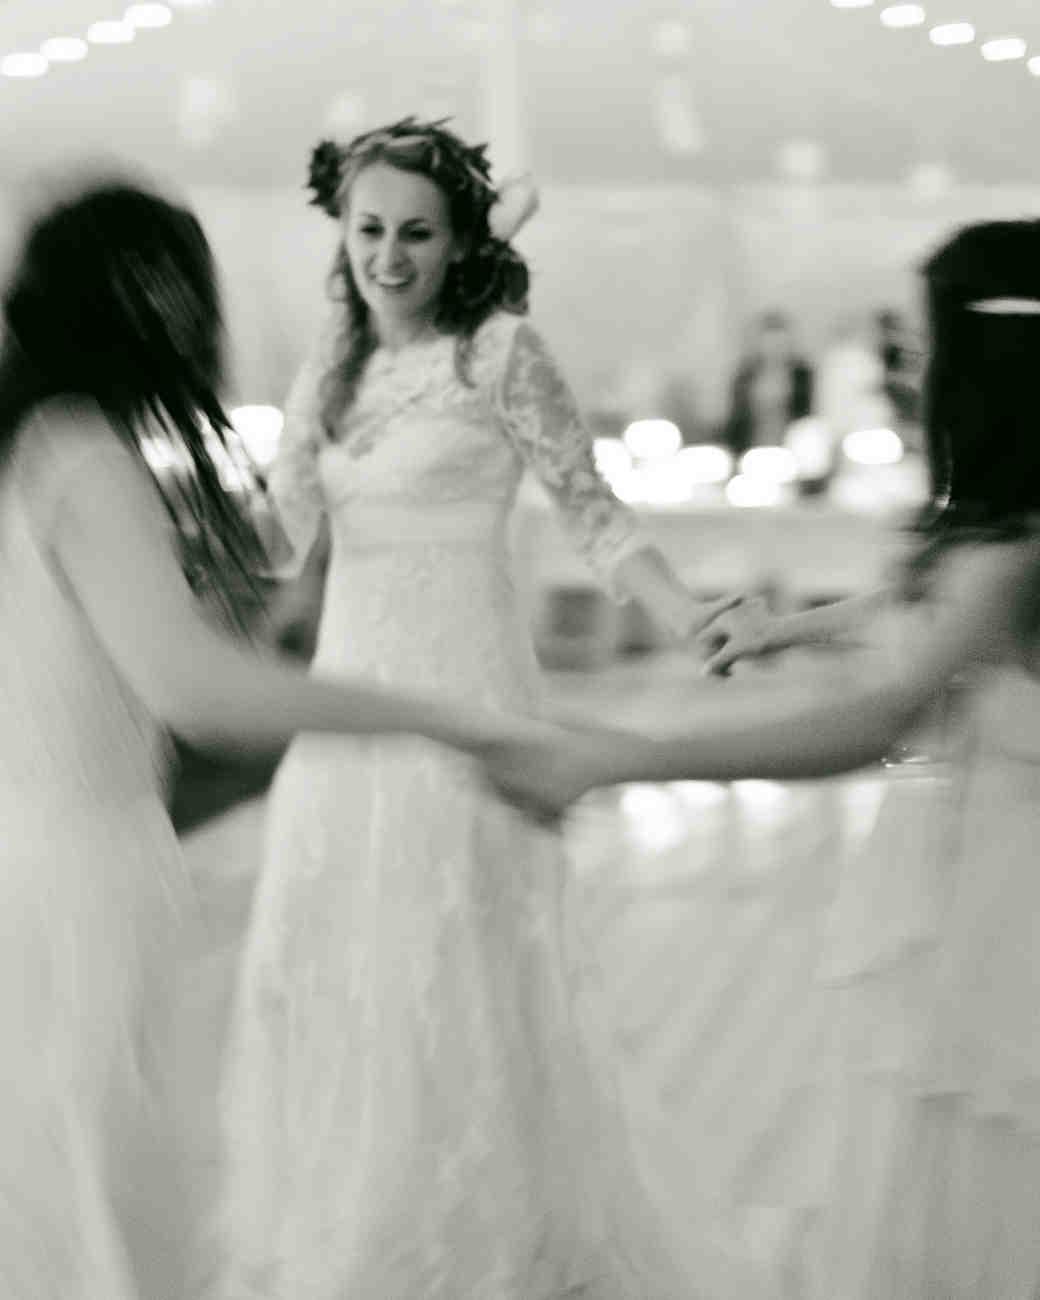 jola-tom-wedding-dance2-0614.jpg